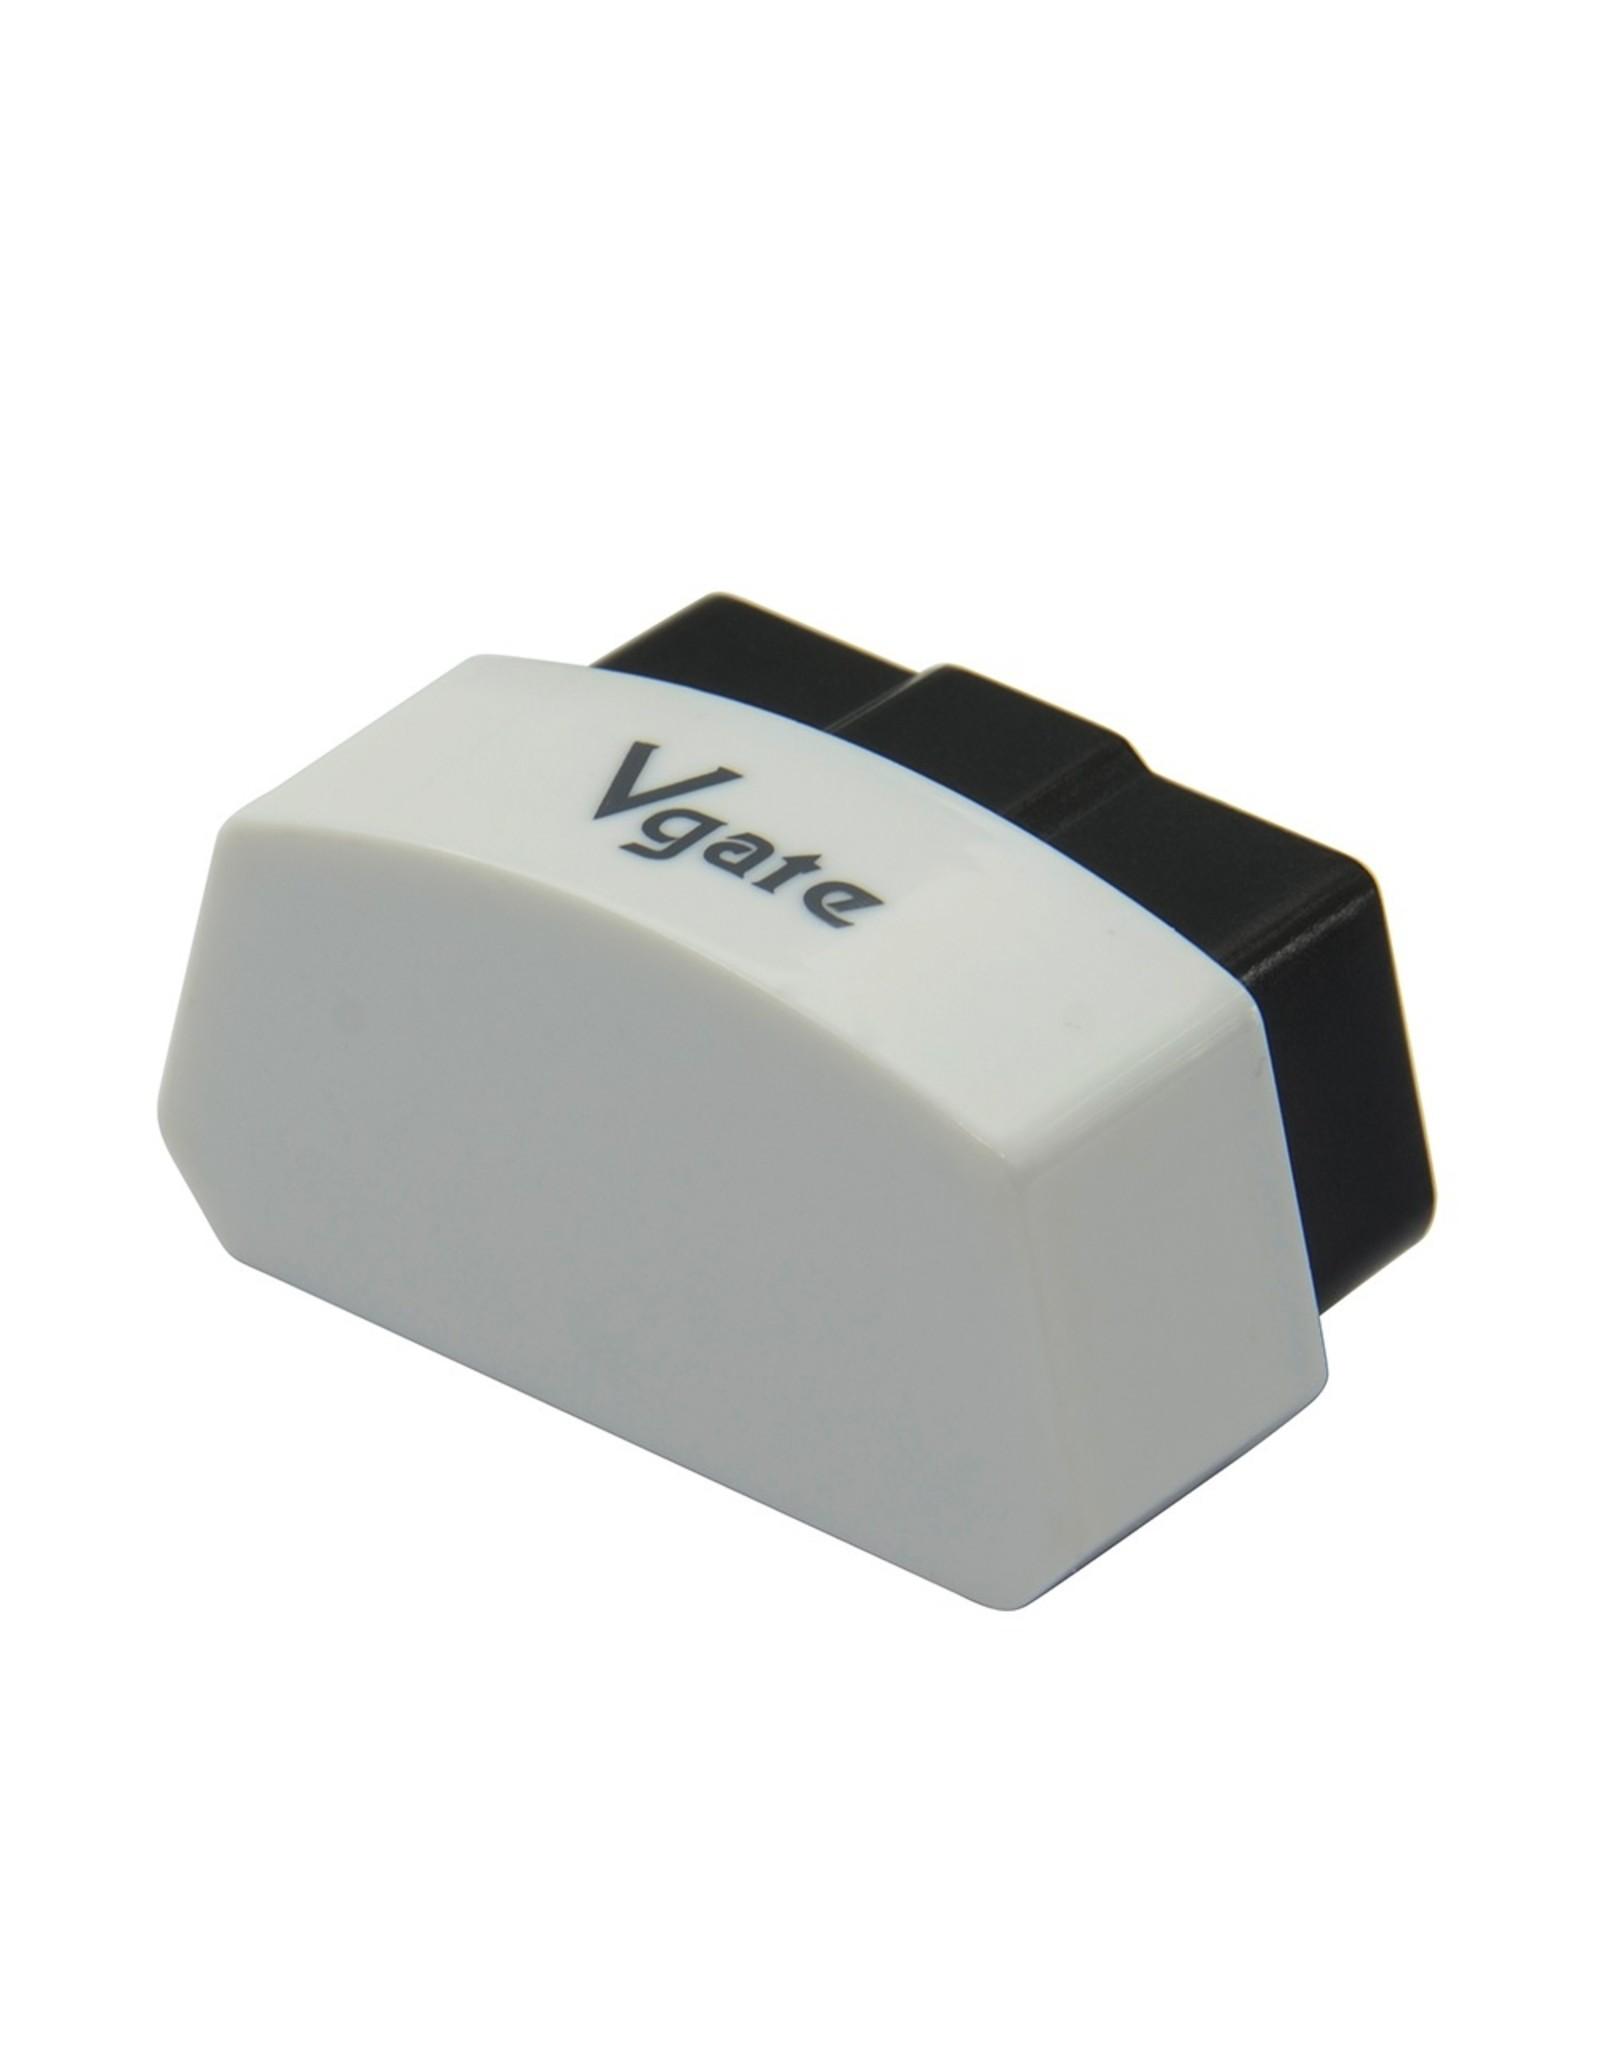 Vgate ICar3 Bluetooth Interface Voor Android Vgate Icar 3 ELM 327 OBD2 Auto Diagnose Scanner